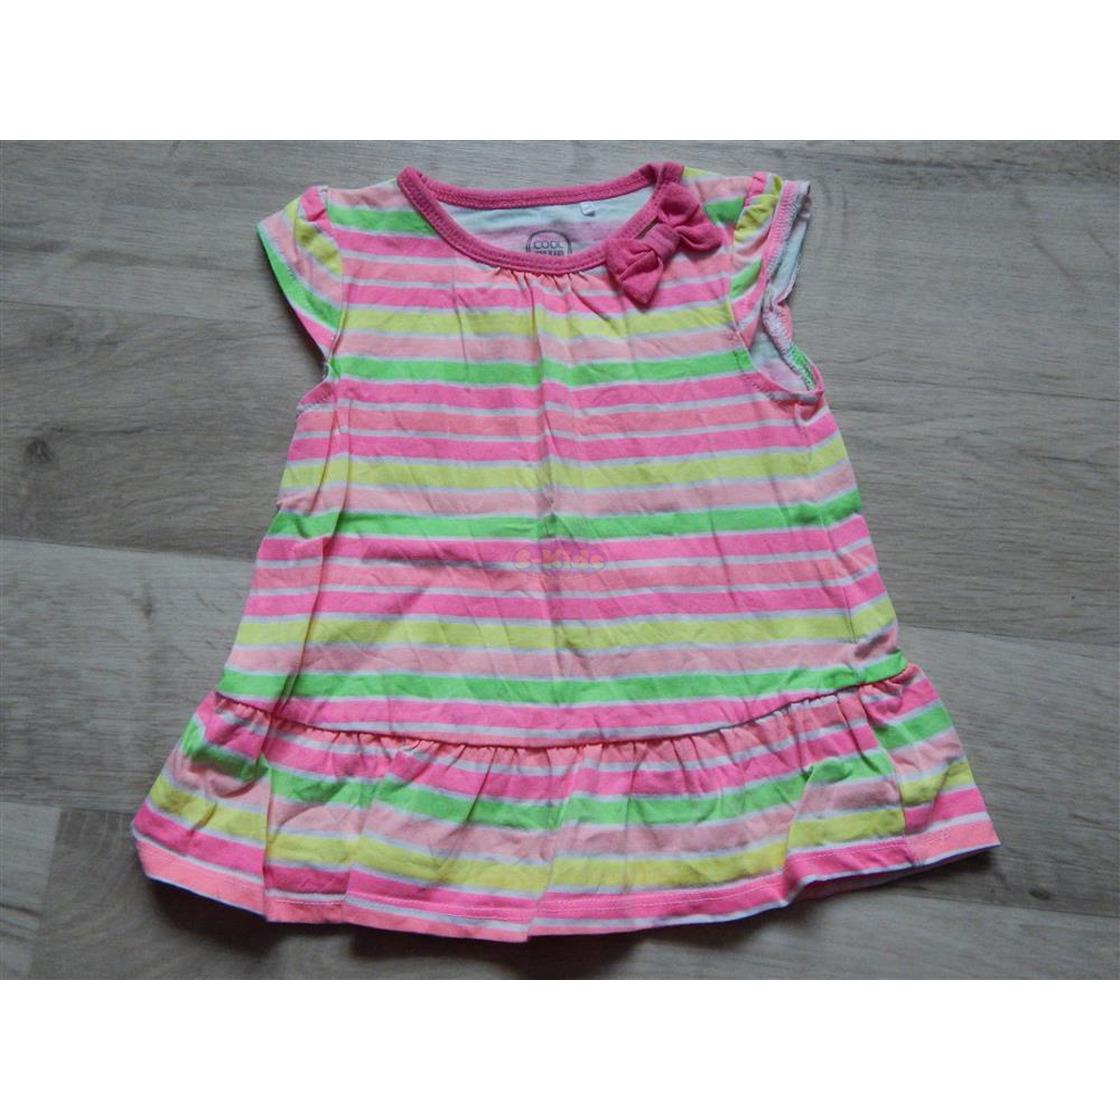 Schnizler Mädchen Sommer Set Bluse Karo Latzhose Rosa 68 74 Hose kurz rosa